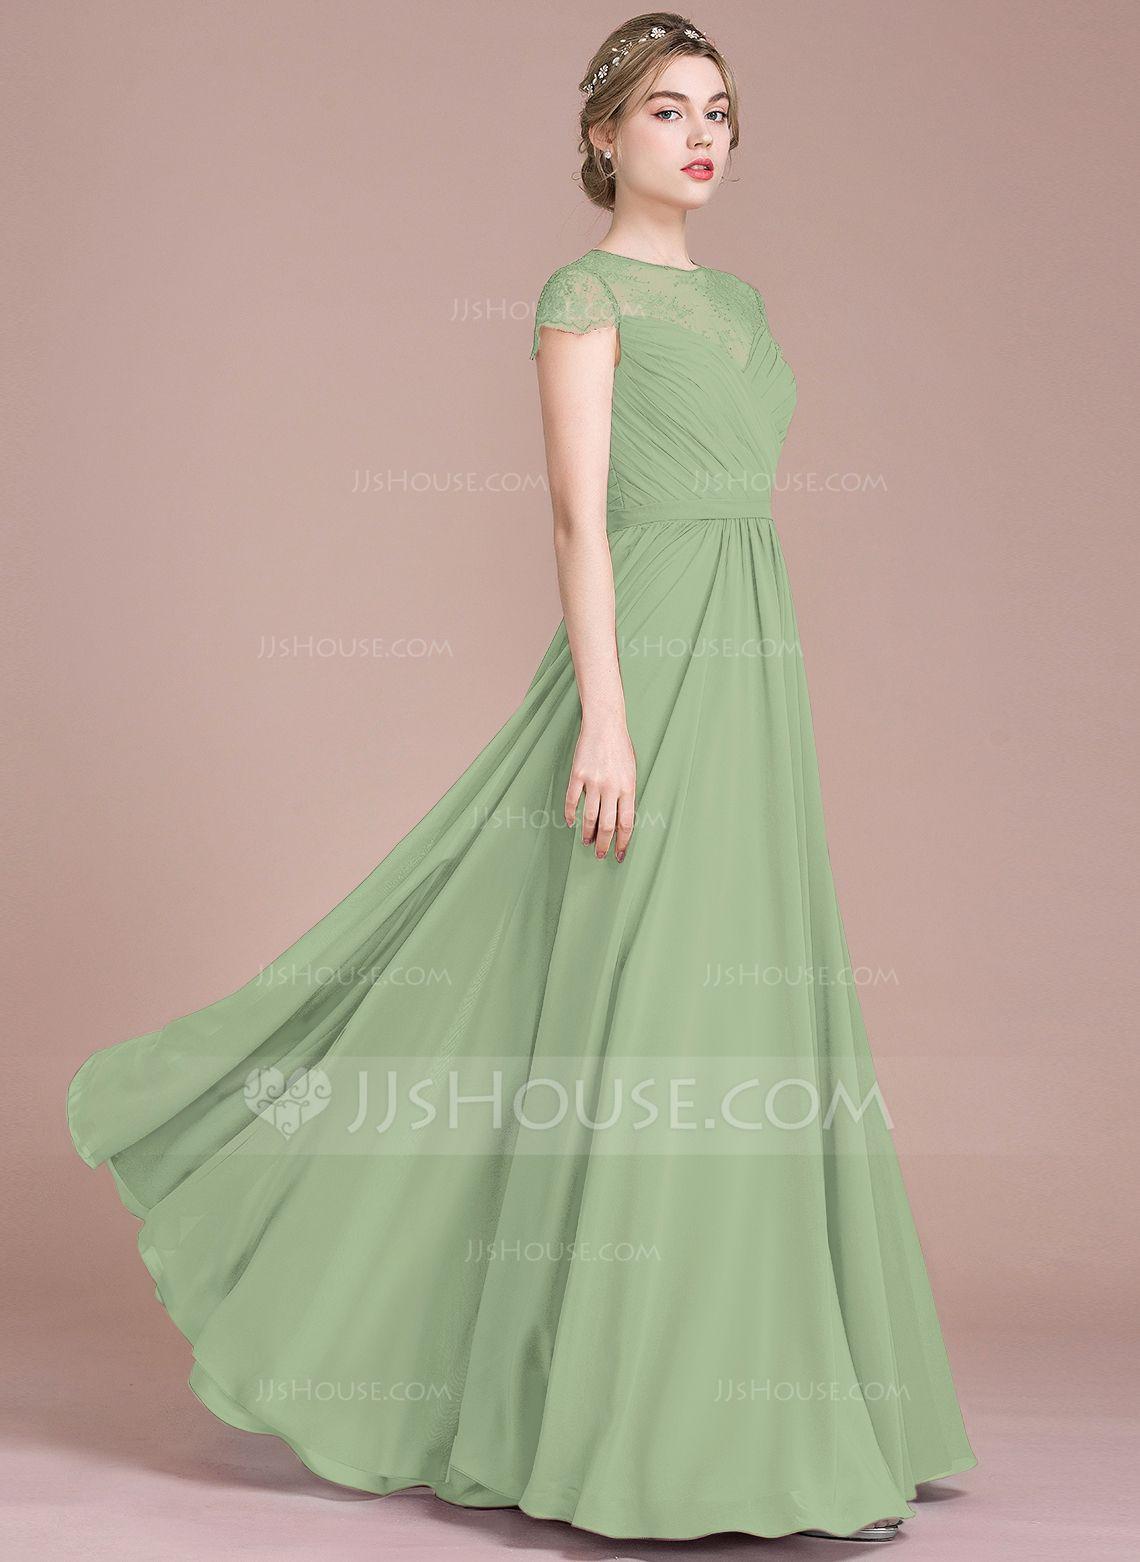 Us 144 00 A Line Princess Scoop Neck Floor Length Chiffon Lace Bridesmaid Dress With Ruffle Jj S House Bridesmaid Dresses Chiffon Lace Dresses [ 1562 x 1140 Pixel ]